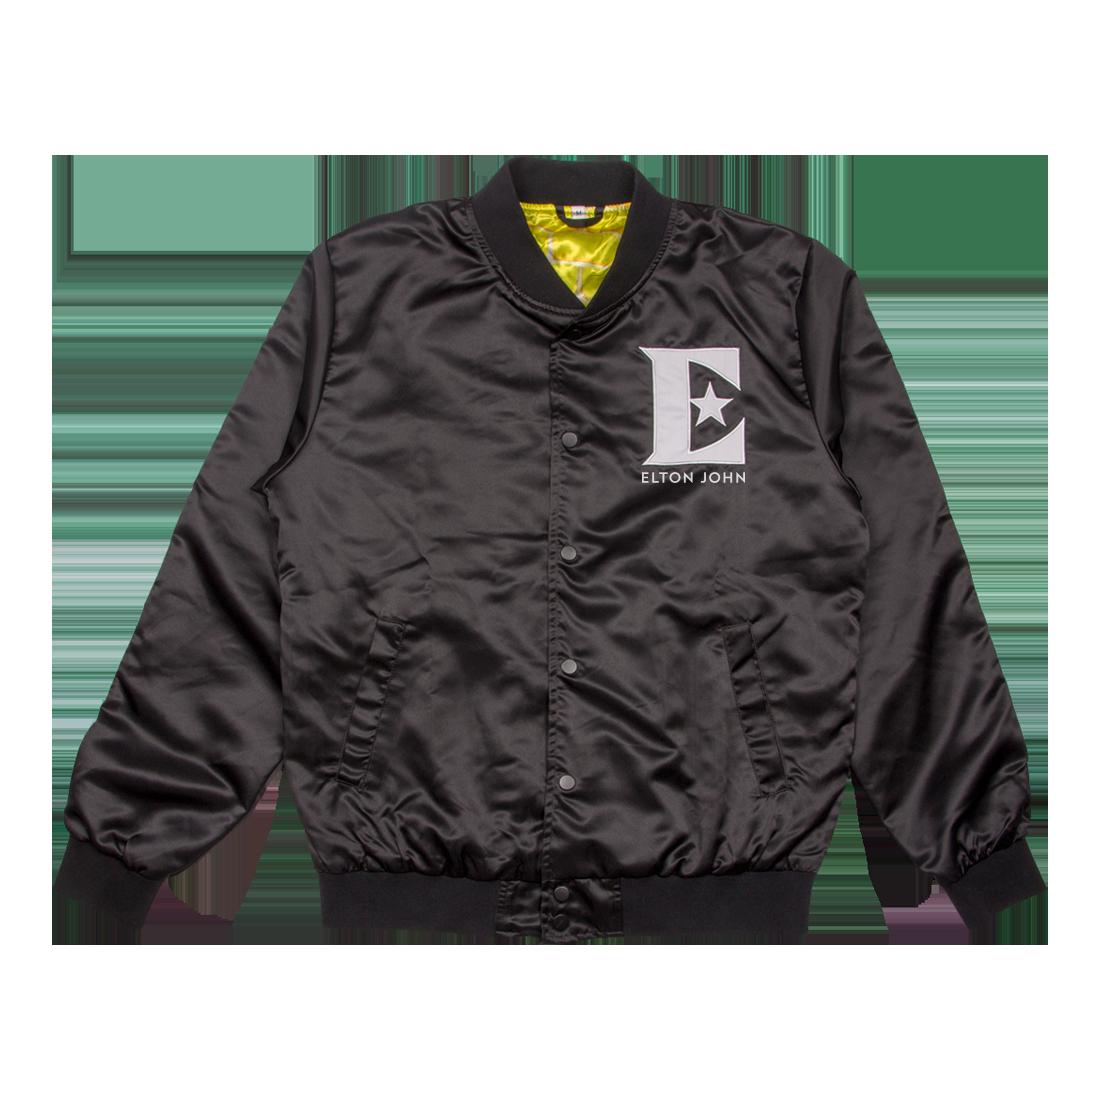 fa4c76b46 Elton John: Farewell Satin Bomber Jacket - S